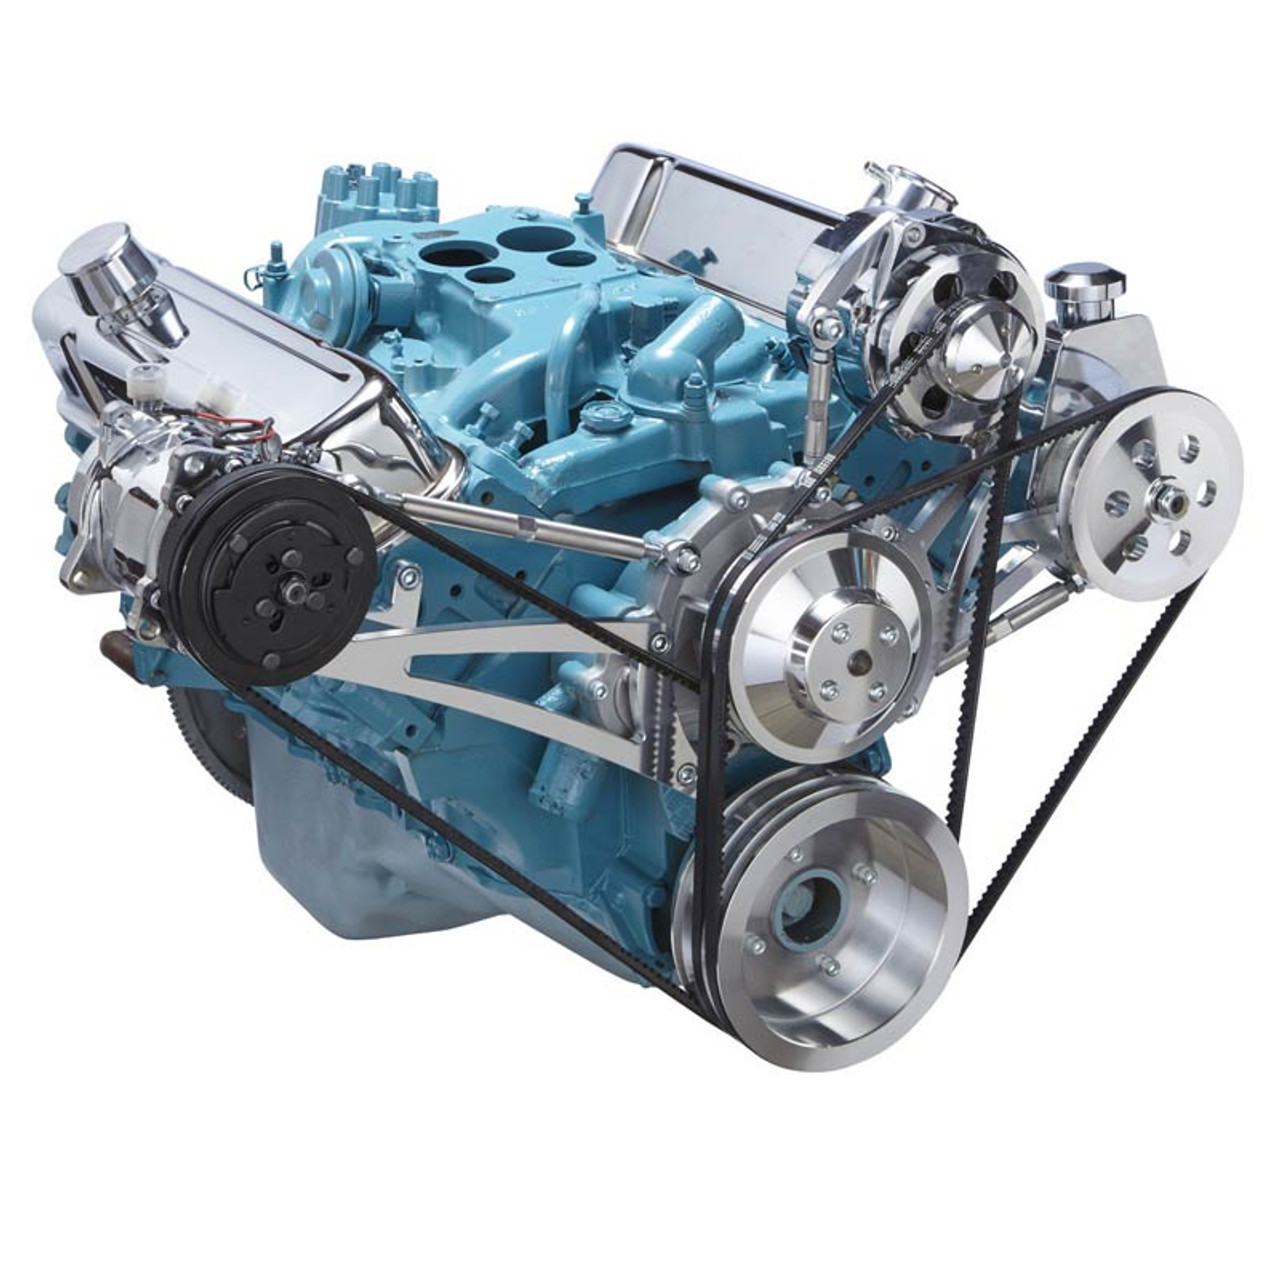 Pontiac Grand Prix Fuel Pump Resistor On 95 Grand Prix Engine Diagram